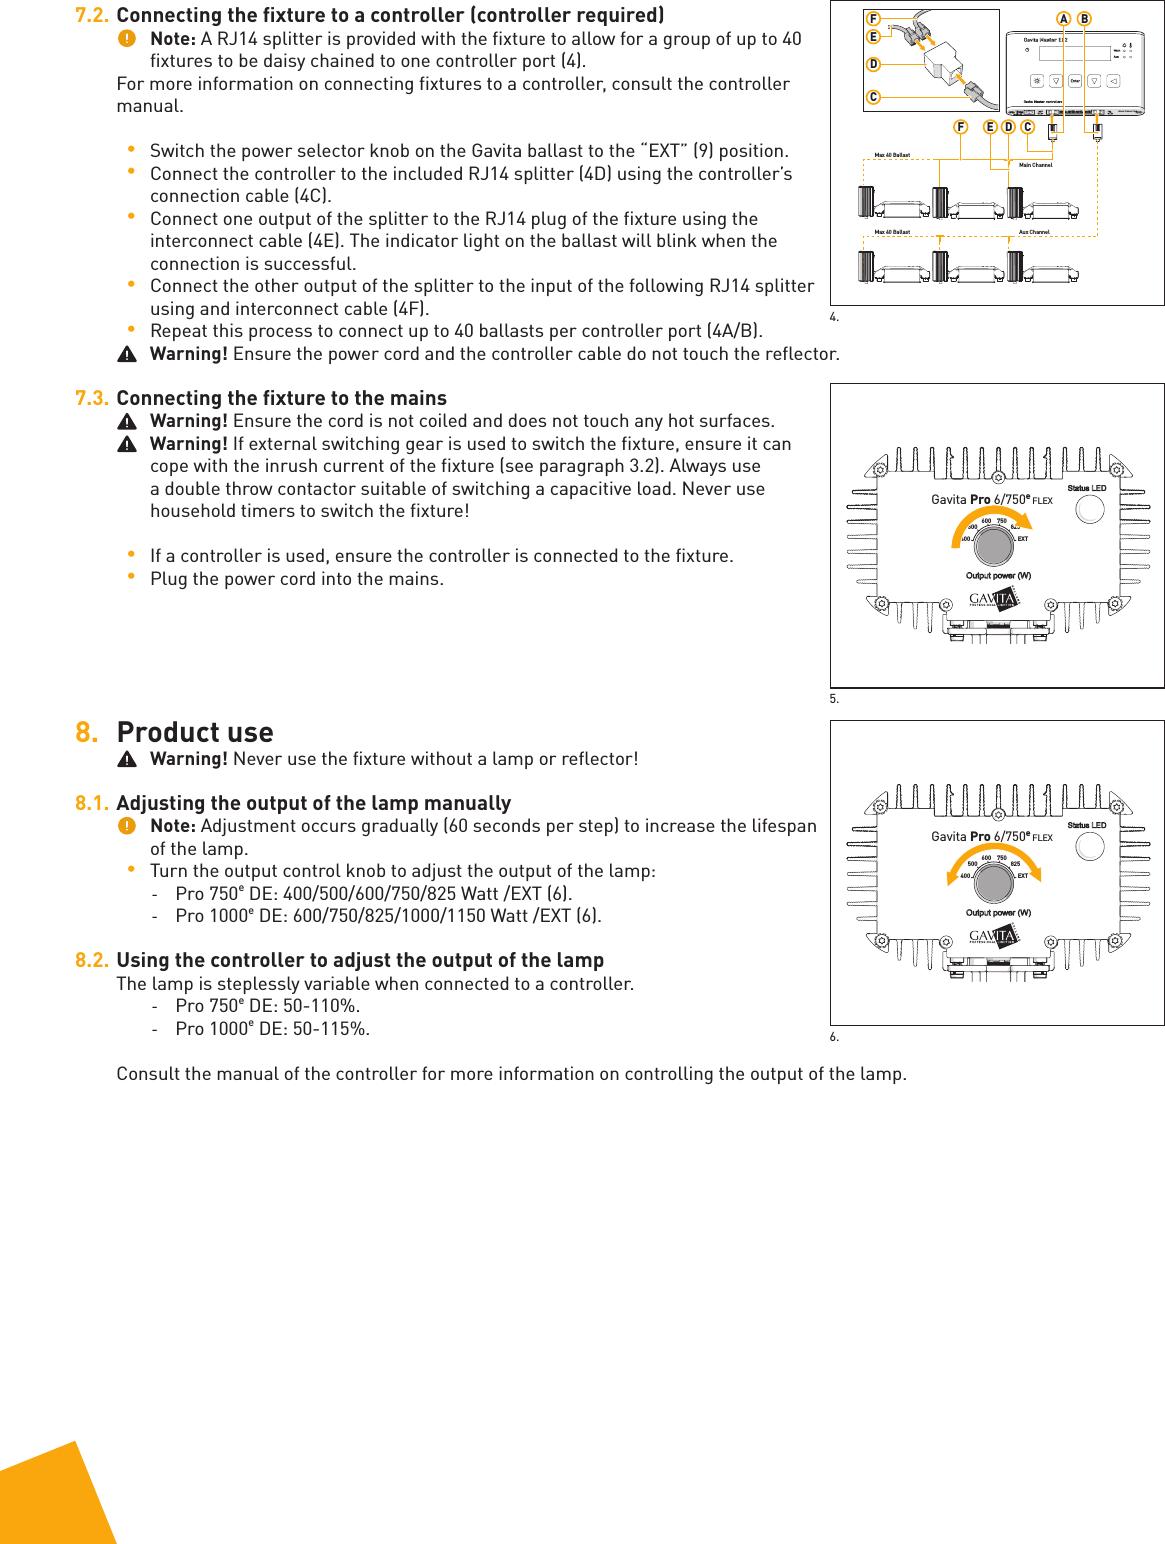 GAVITA HOLLAND 1860X41421 Digital Ballast User Manual